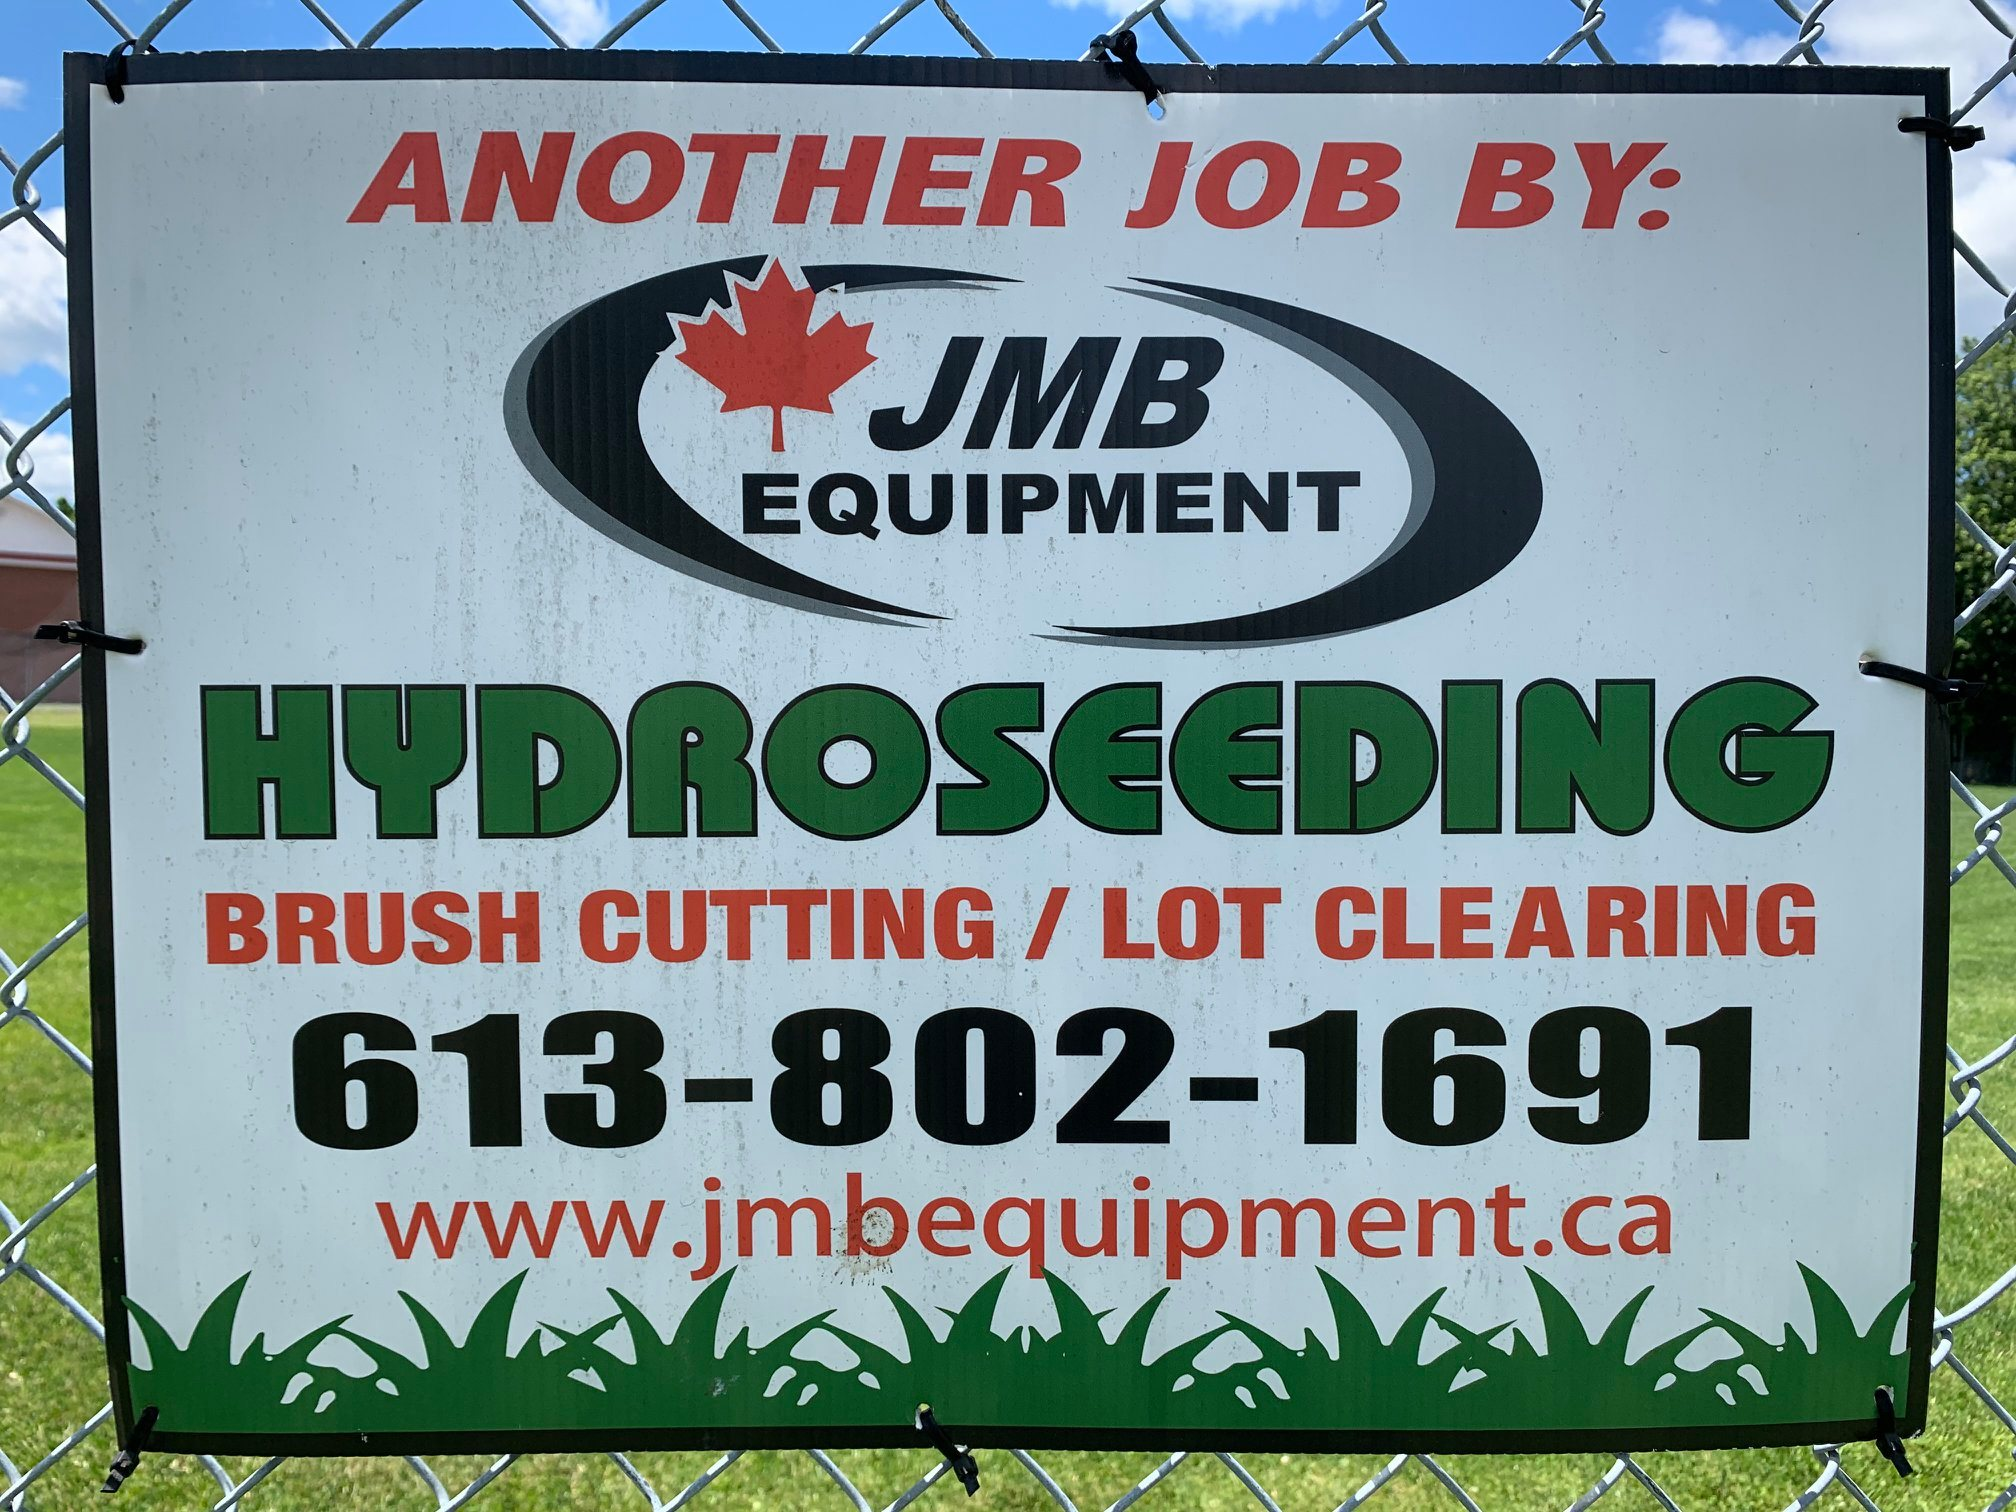 another job by JMB equipment hydroseeding, brush cutting/lot clearing. 613-802-1691 www.jmbequipment.ca